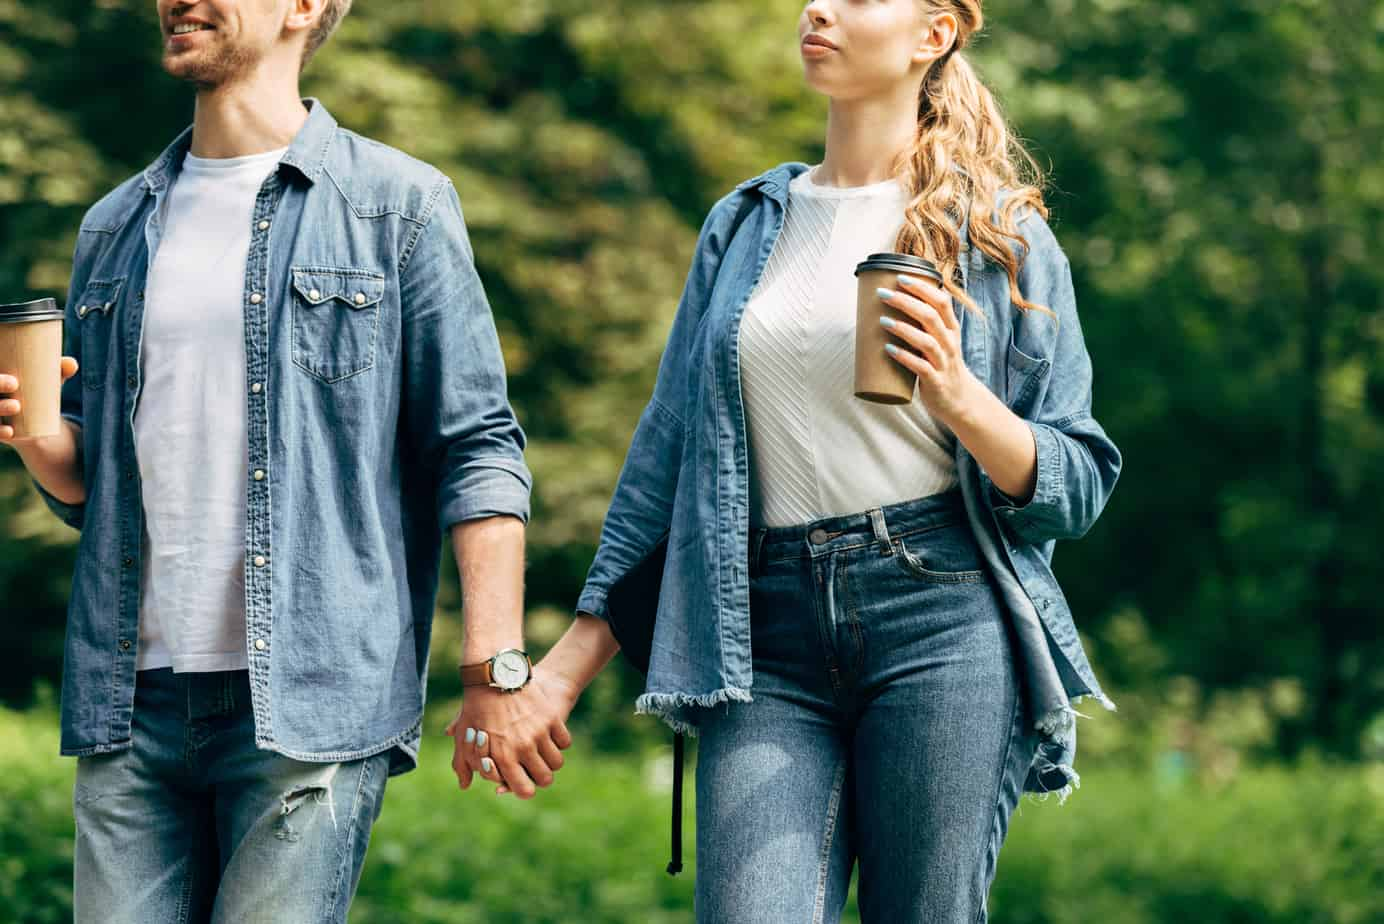 Five Fun and Interesting Second Date Ideas That Aren't a Cliché